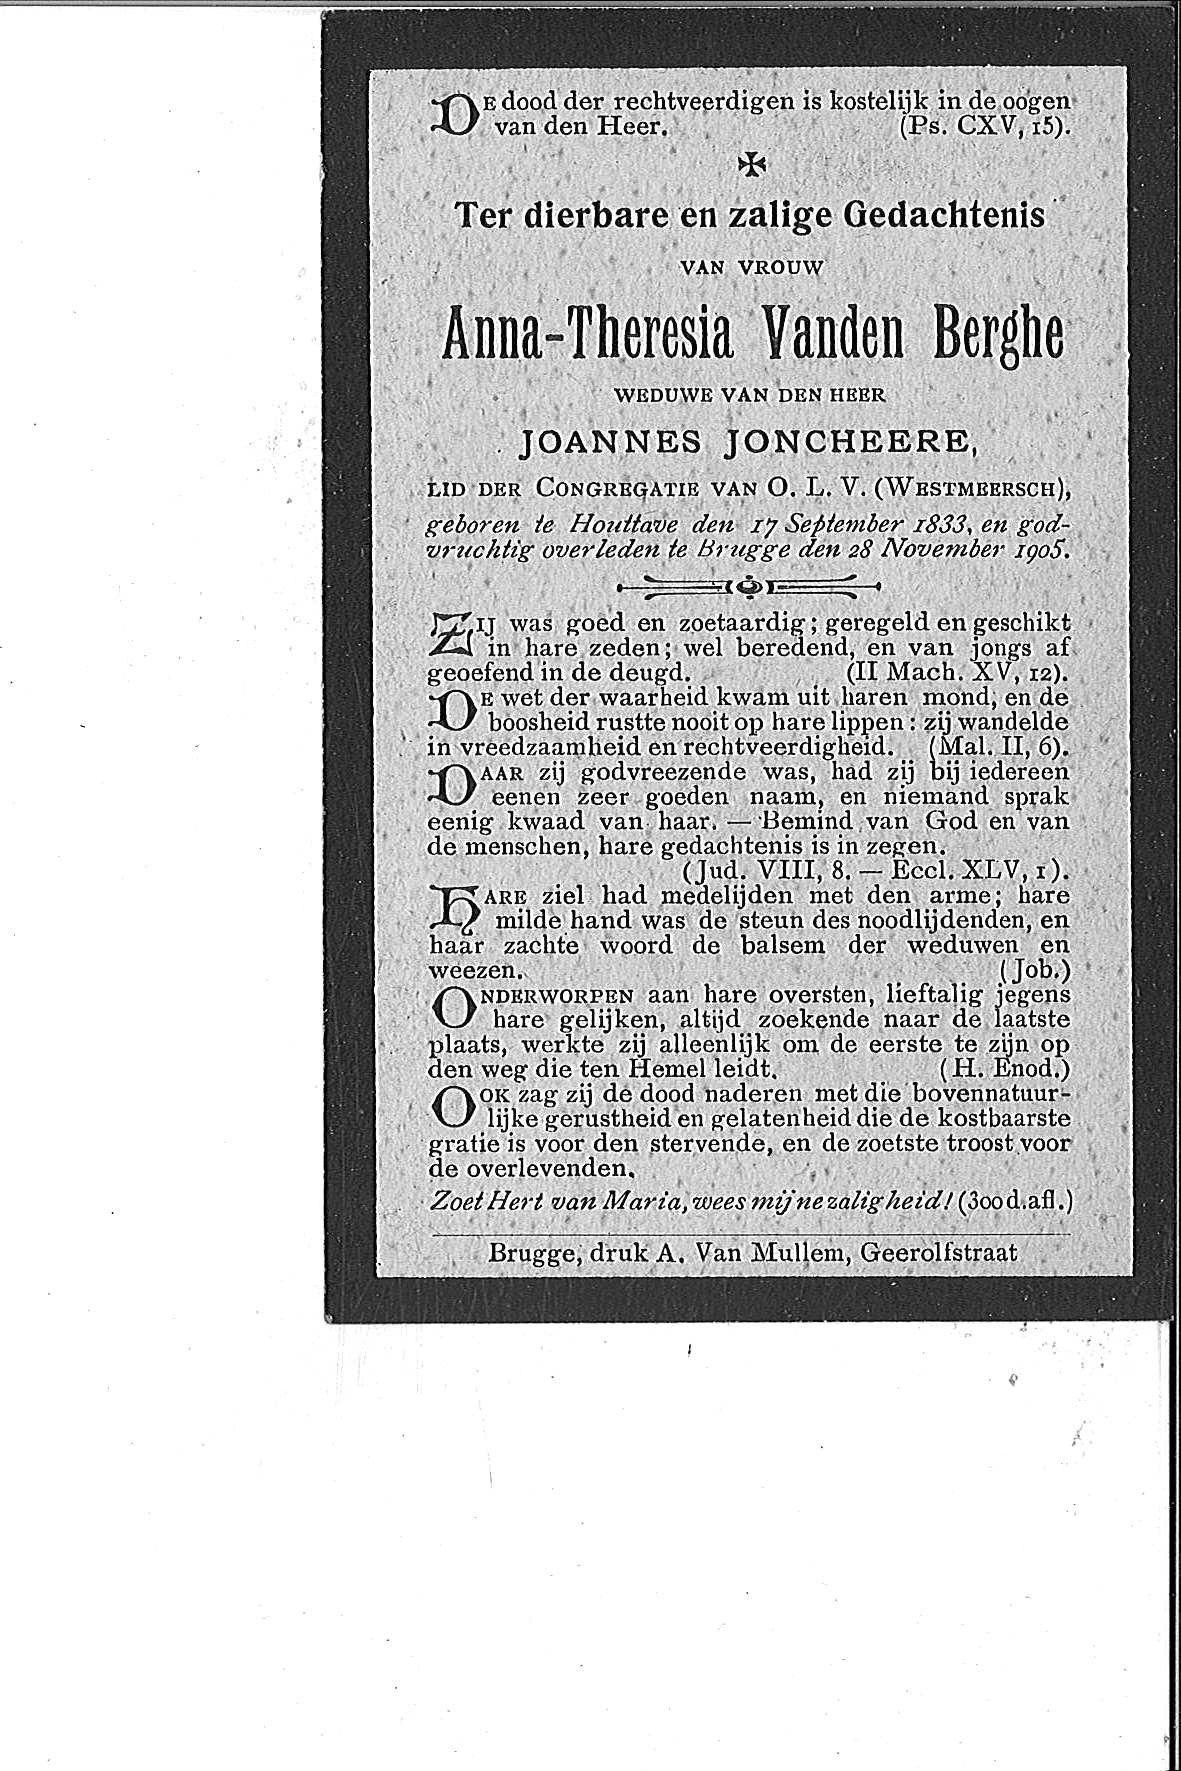 Anna_Theresia(1905)20150807111619_00009.jpg